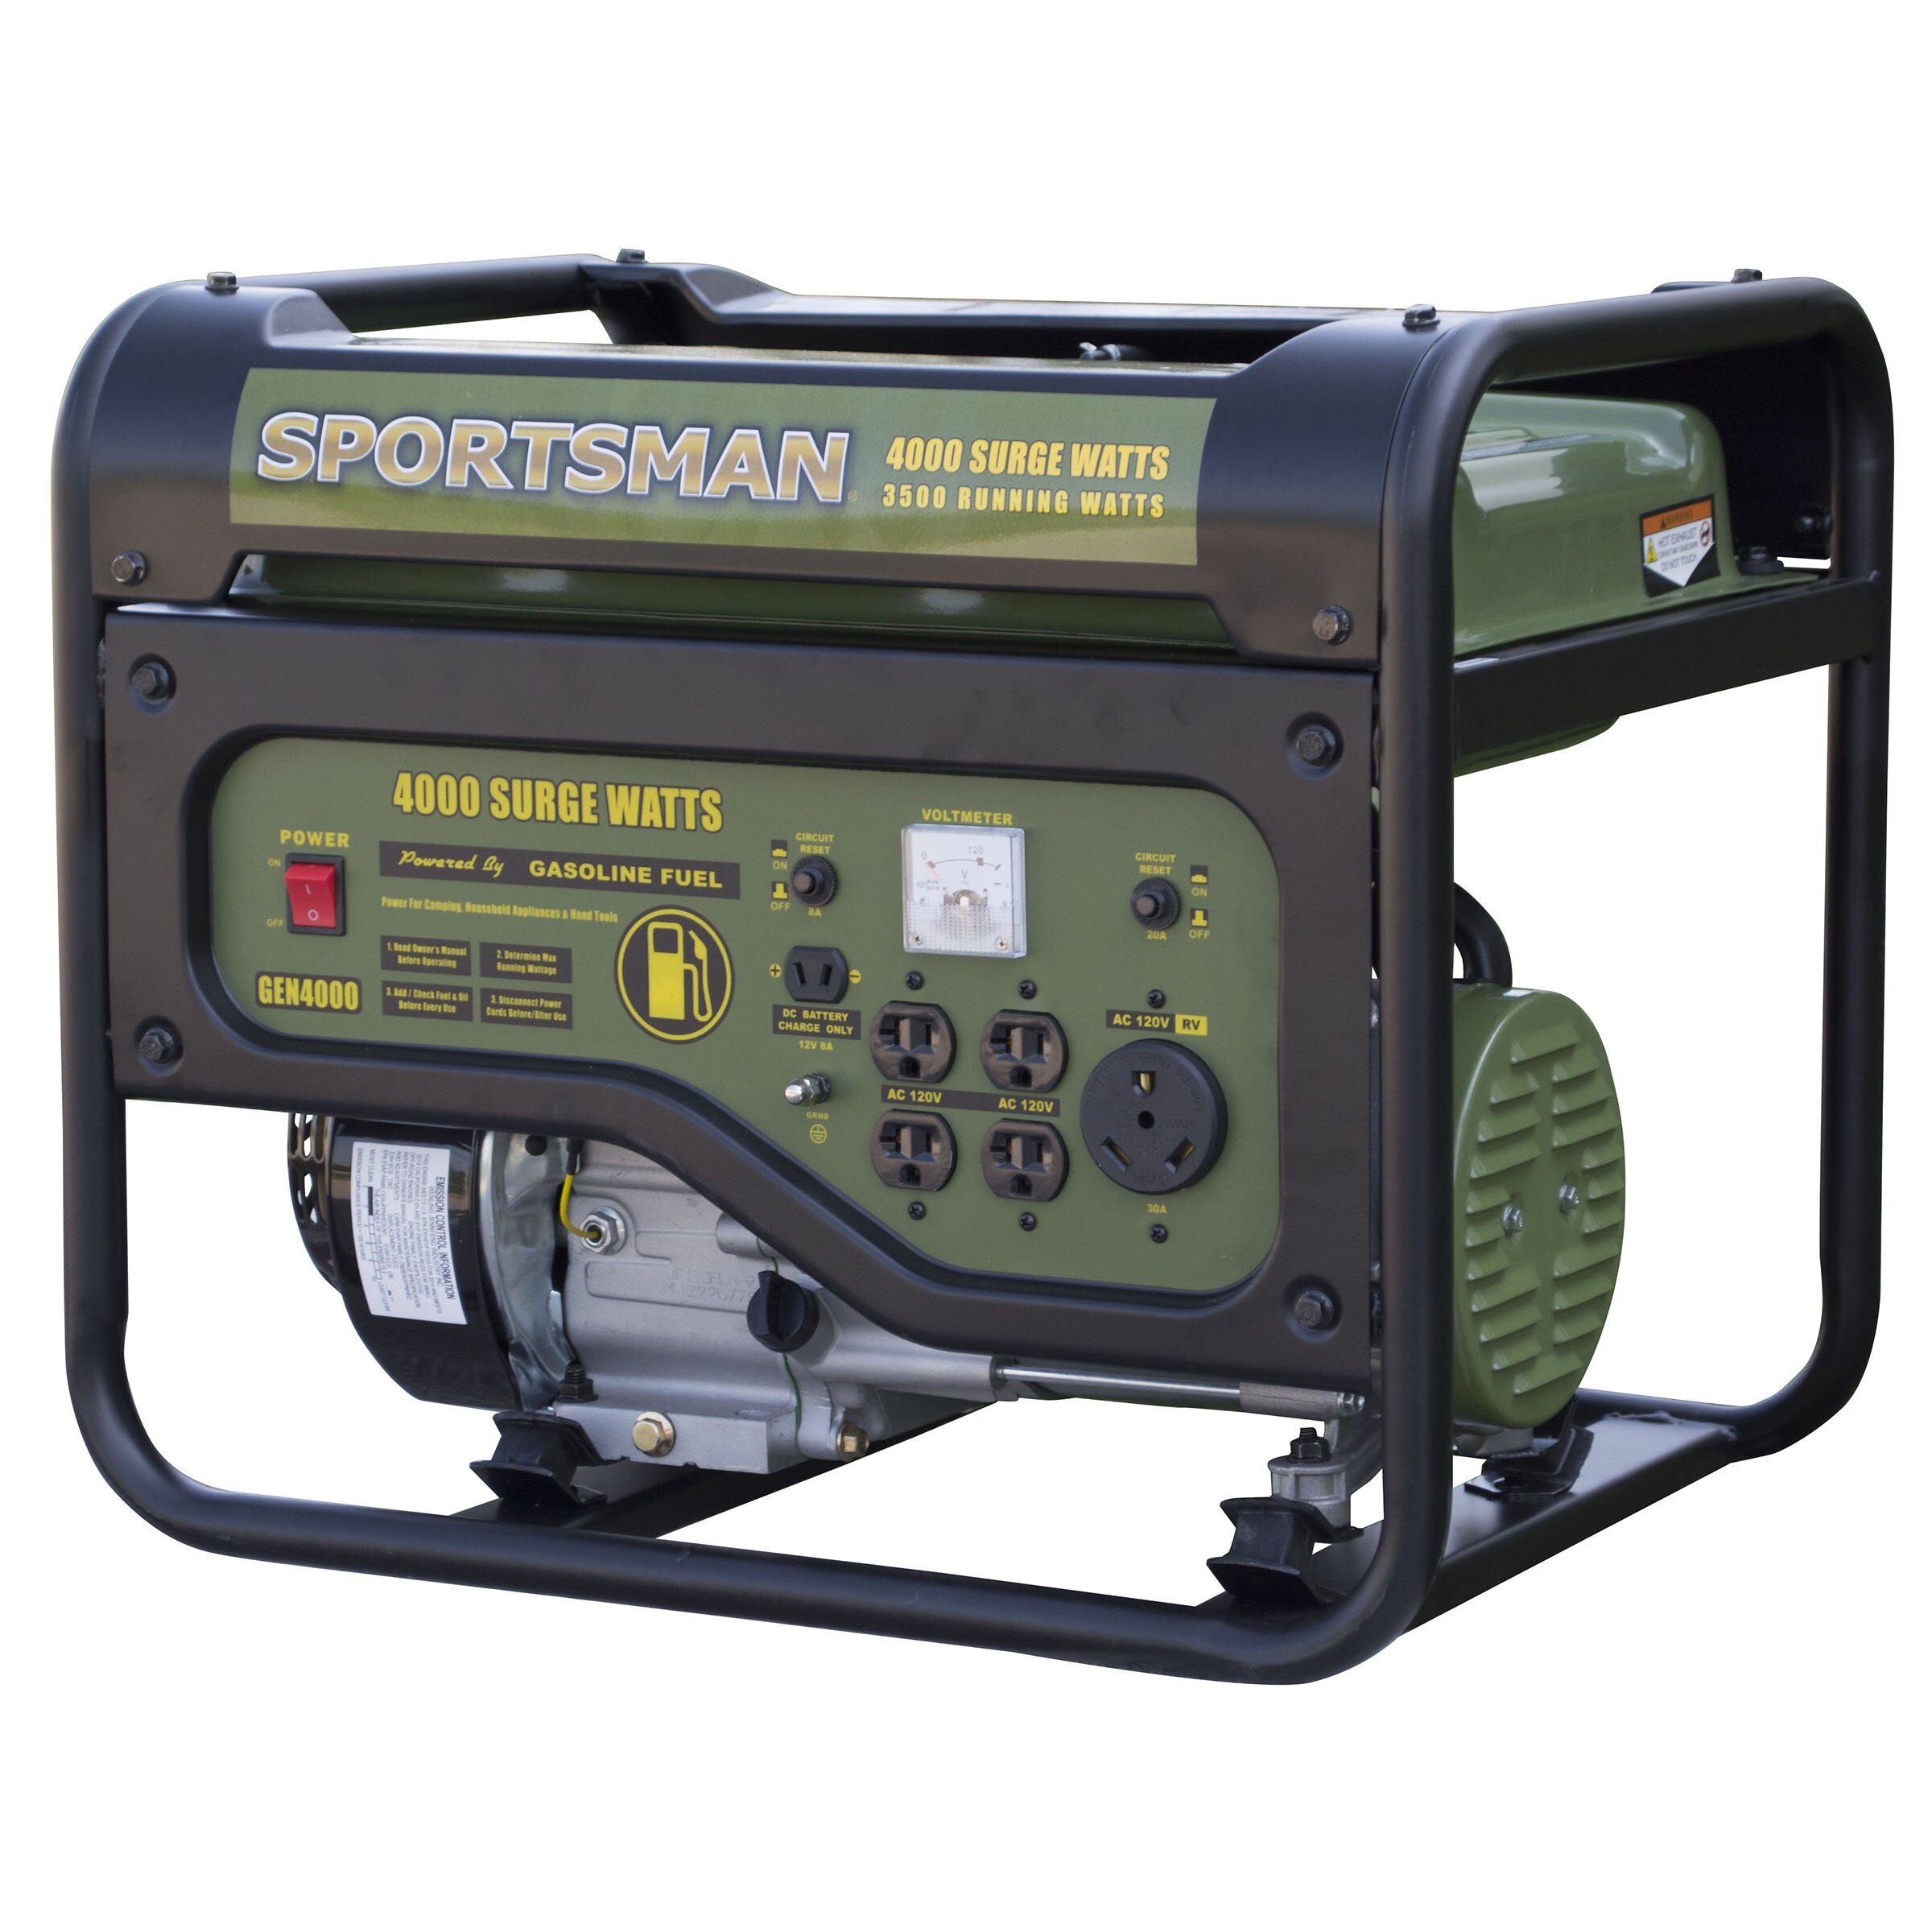 Sportsman 4000 Watt CARB Portable Gasoline Generator | Wayfair.ca